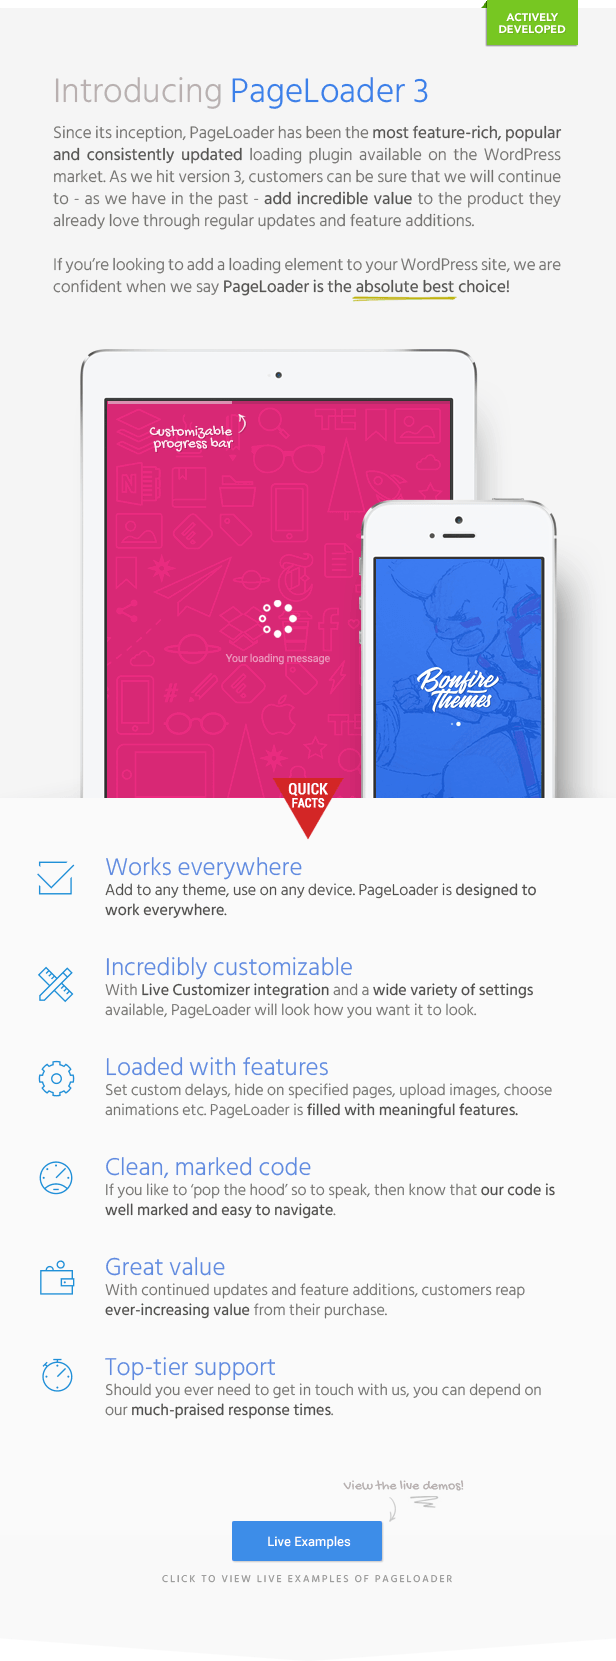 PageLoader 2.0 intro